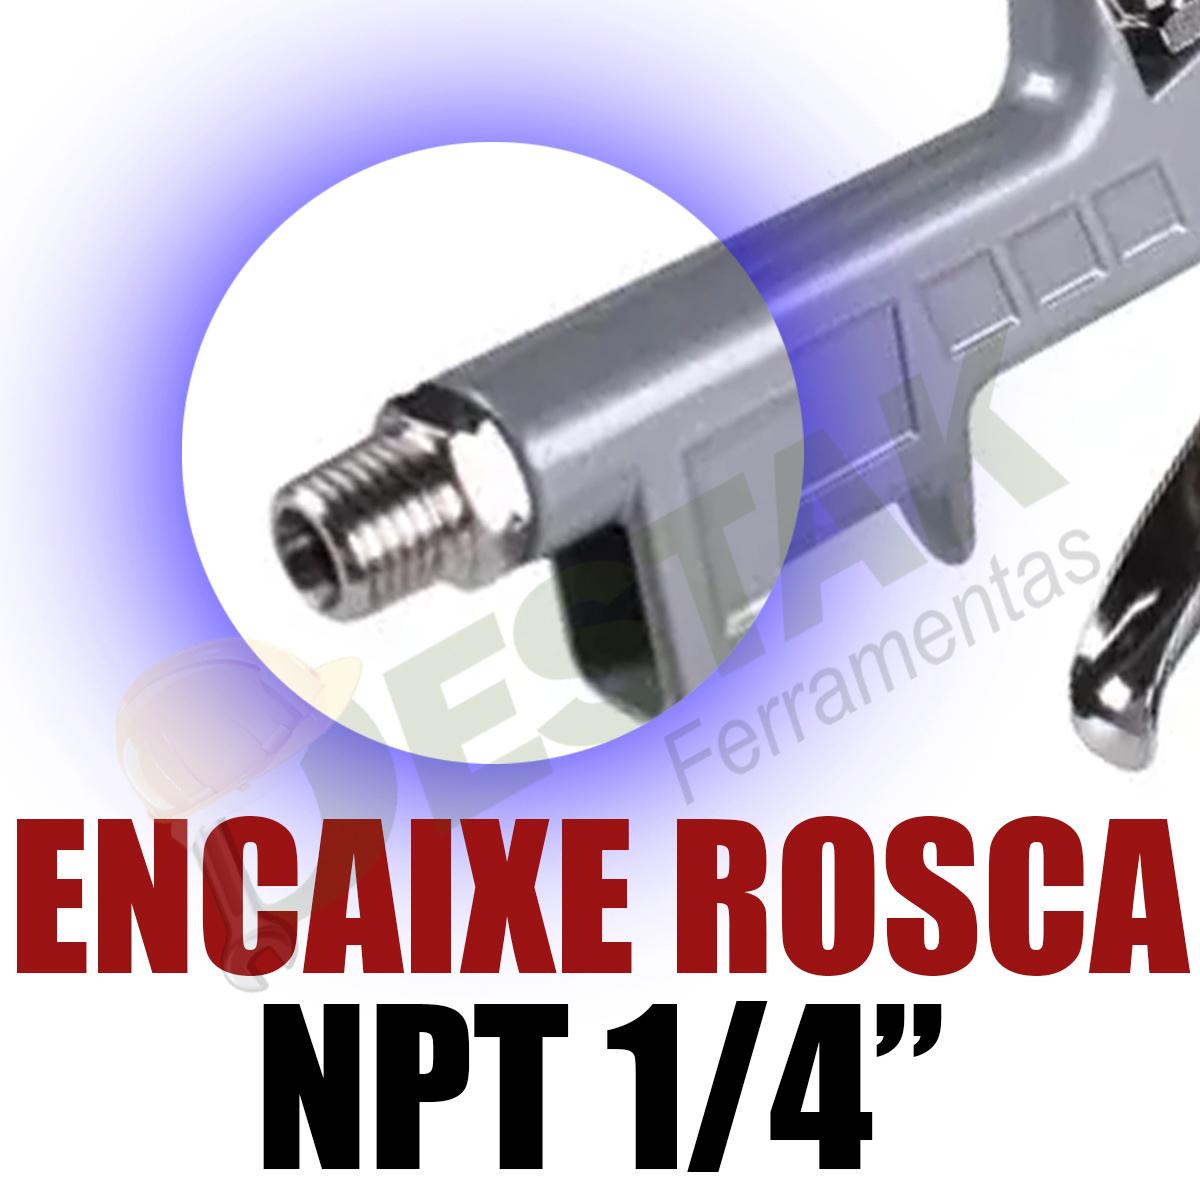 Kit Pistola Pintura Hvlp Stels 600ml + Mangueira Engate Npt